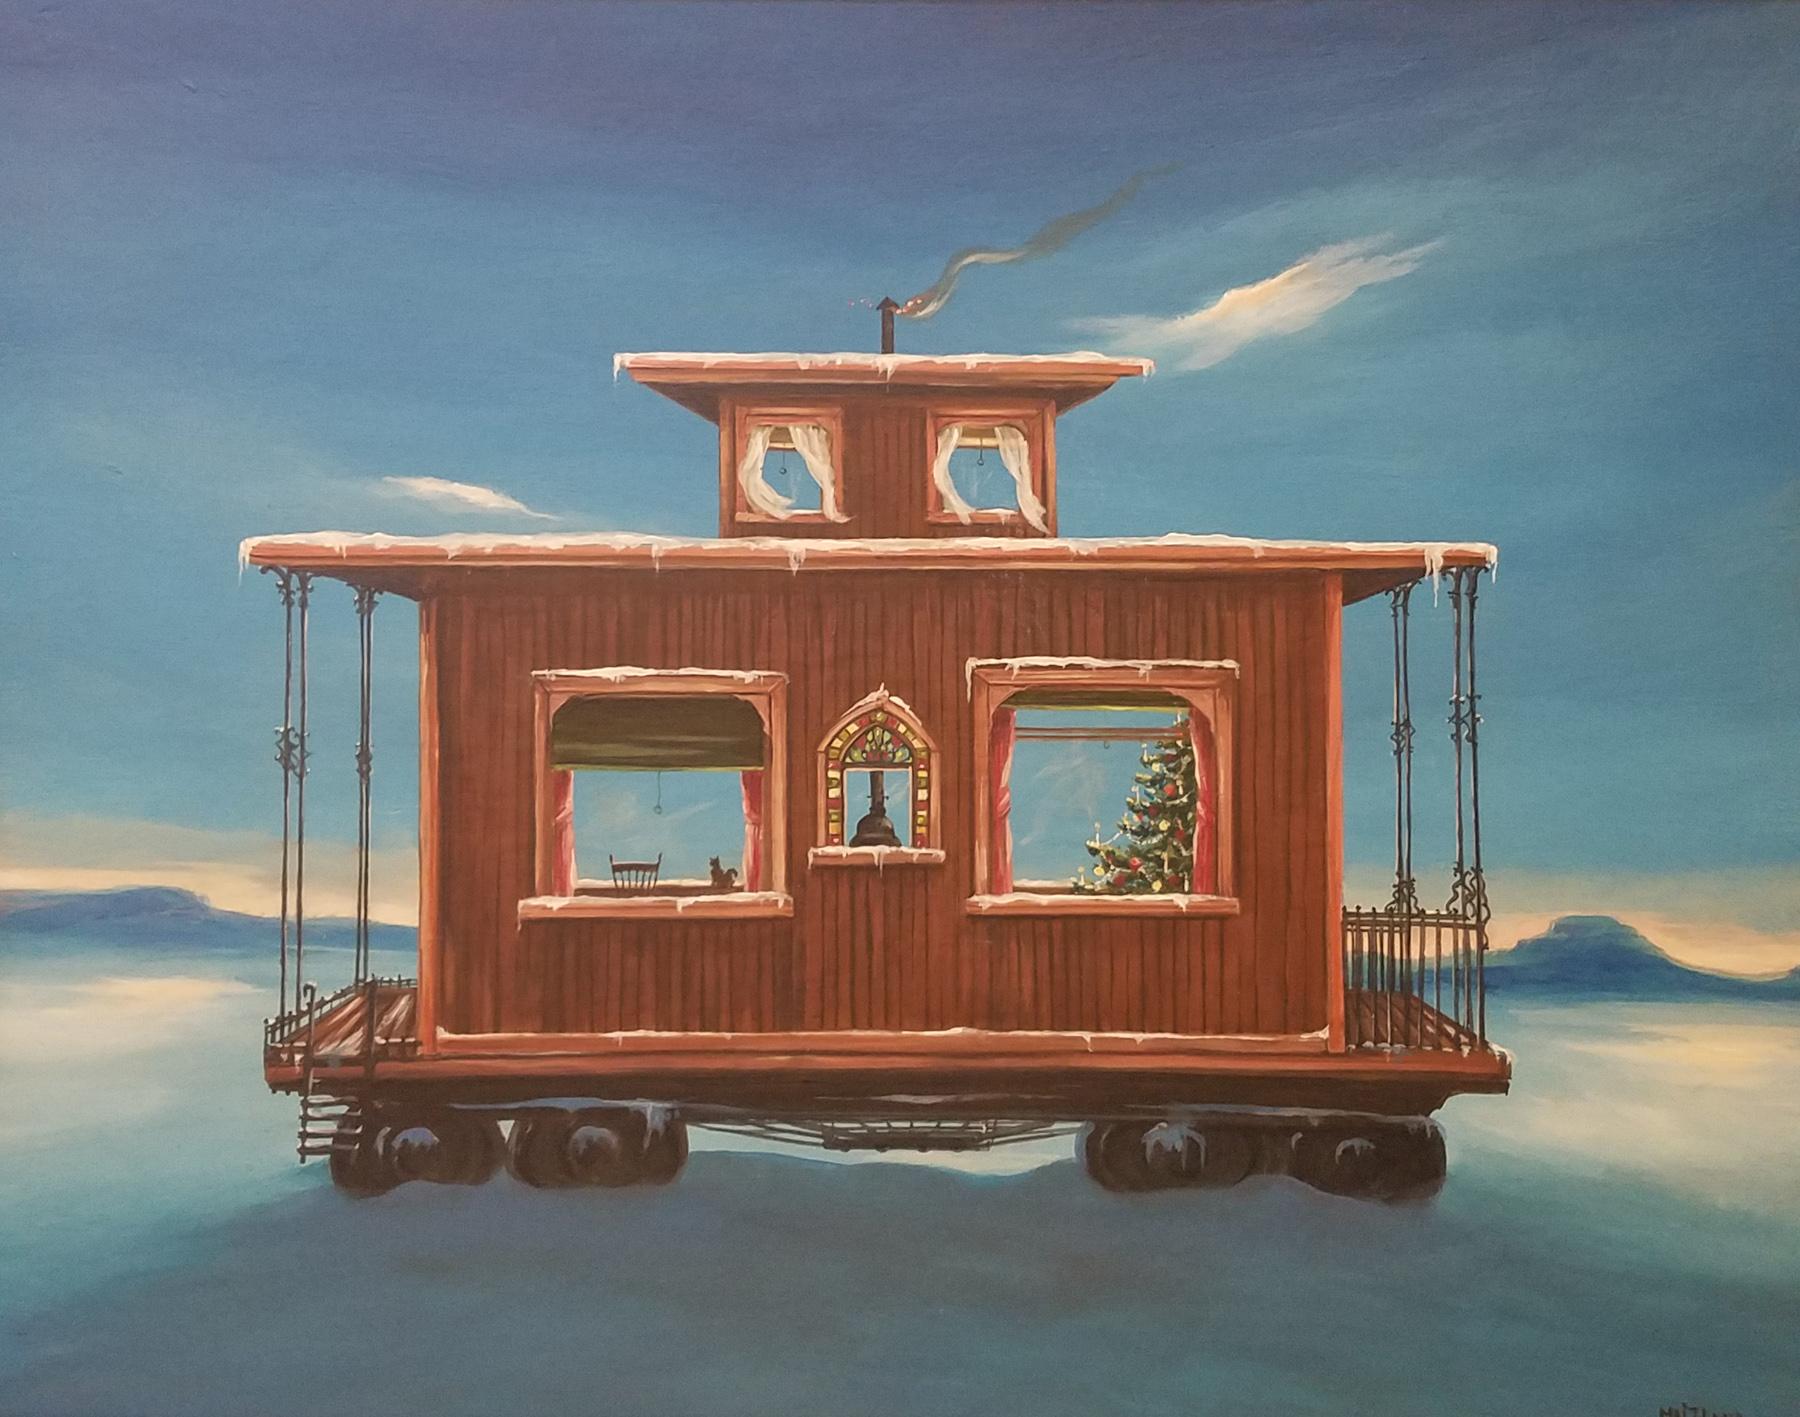 Robert Maitland: Caboose Christmas